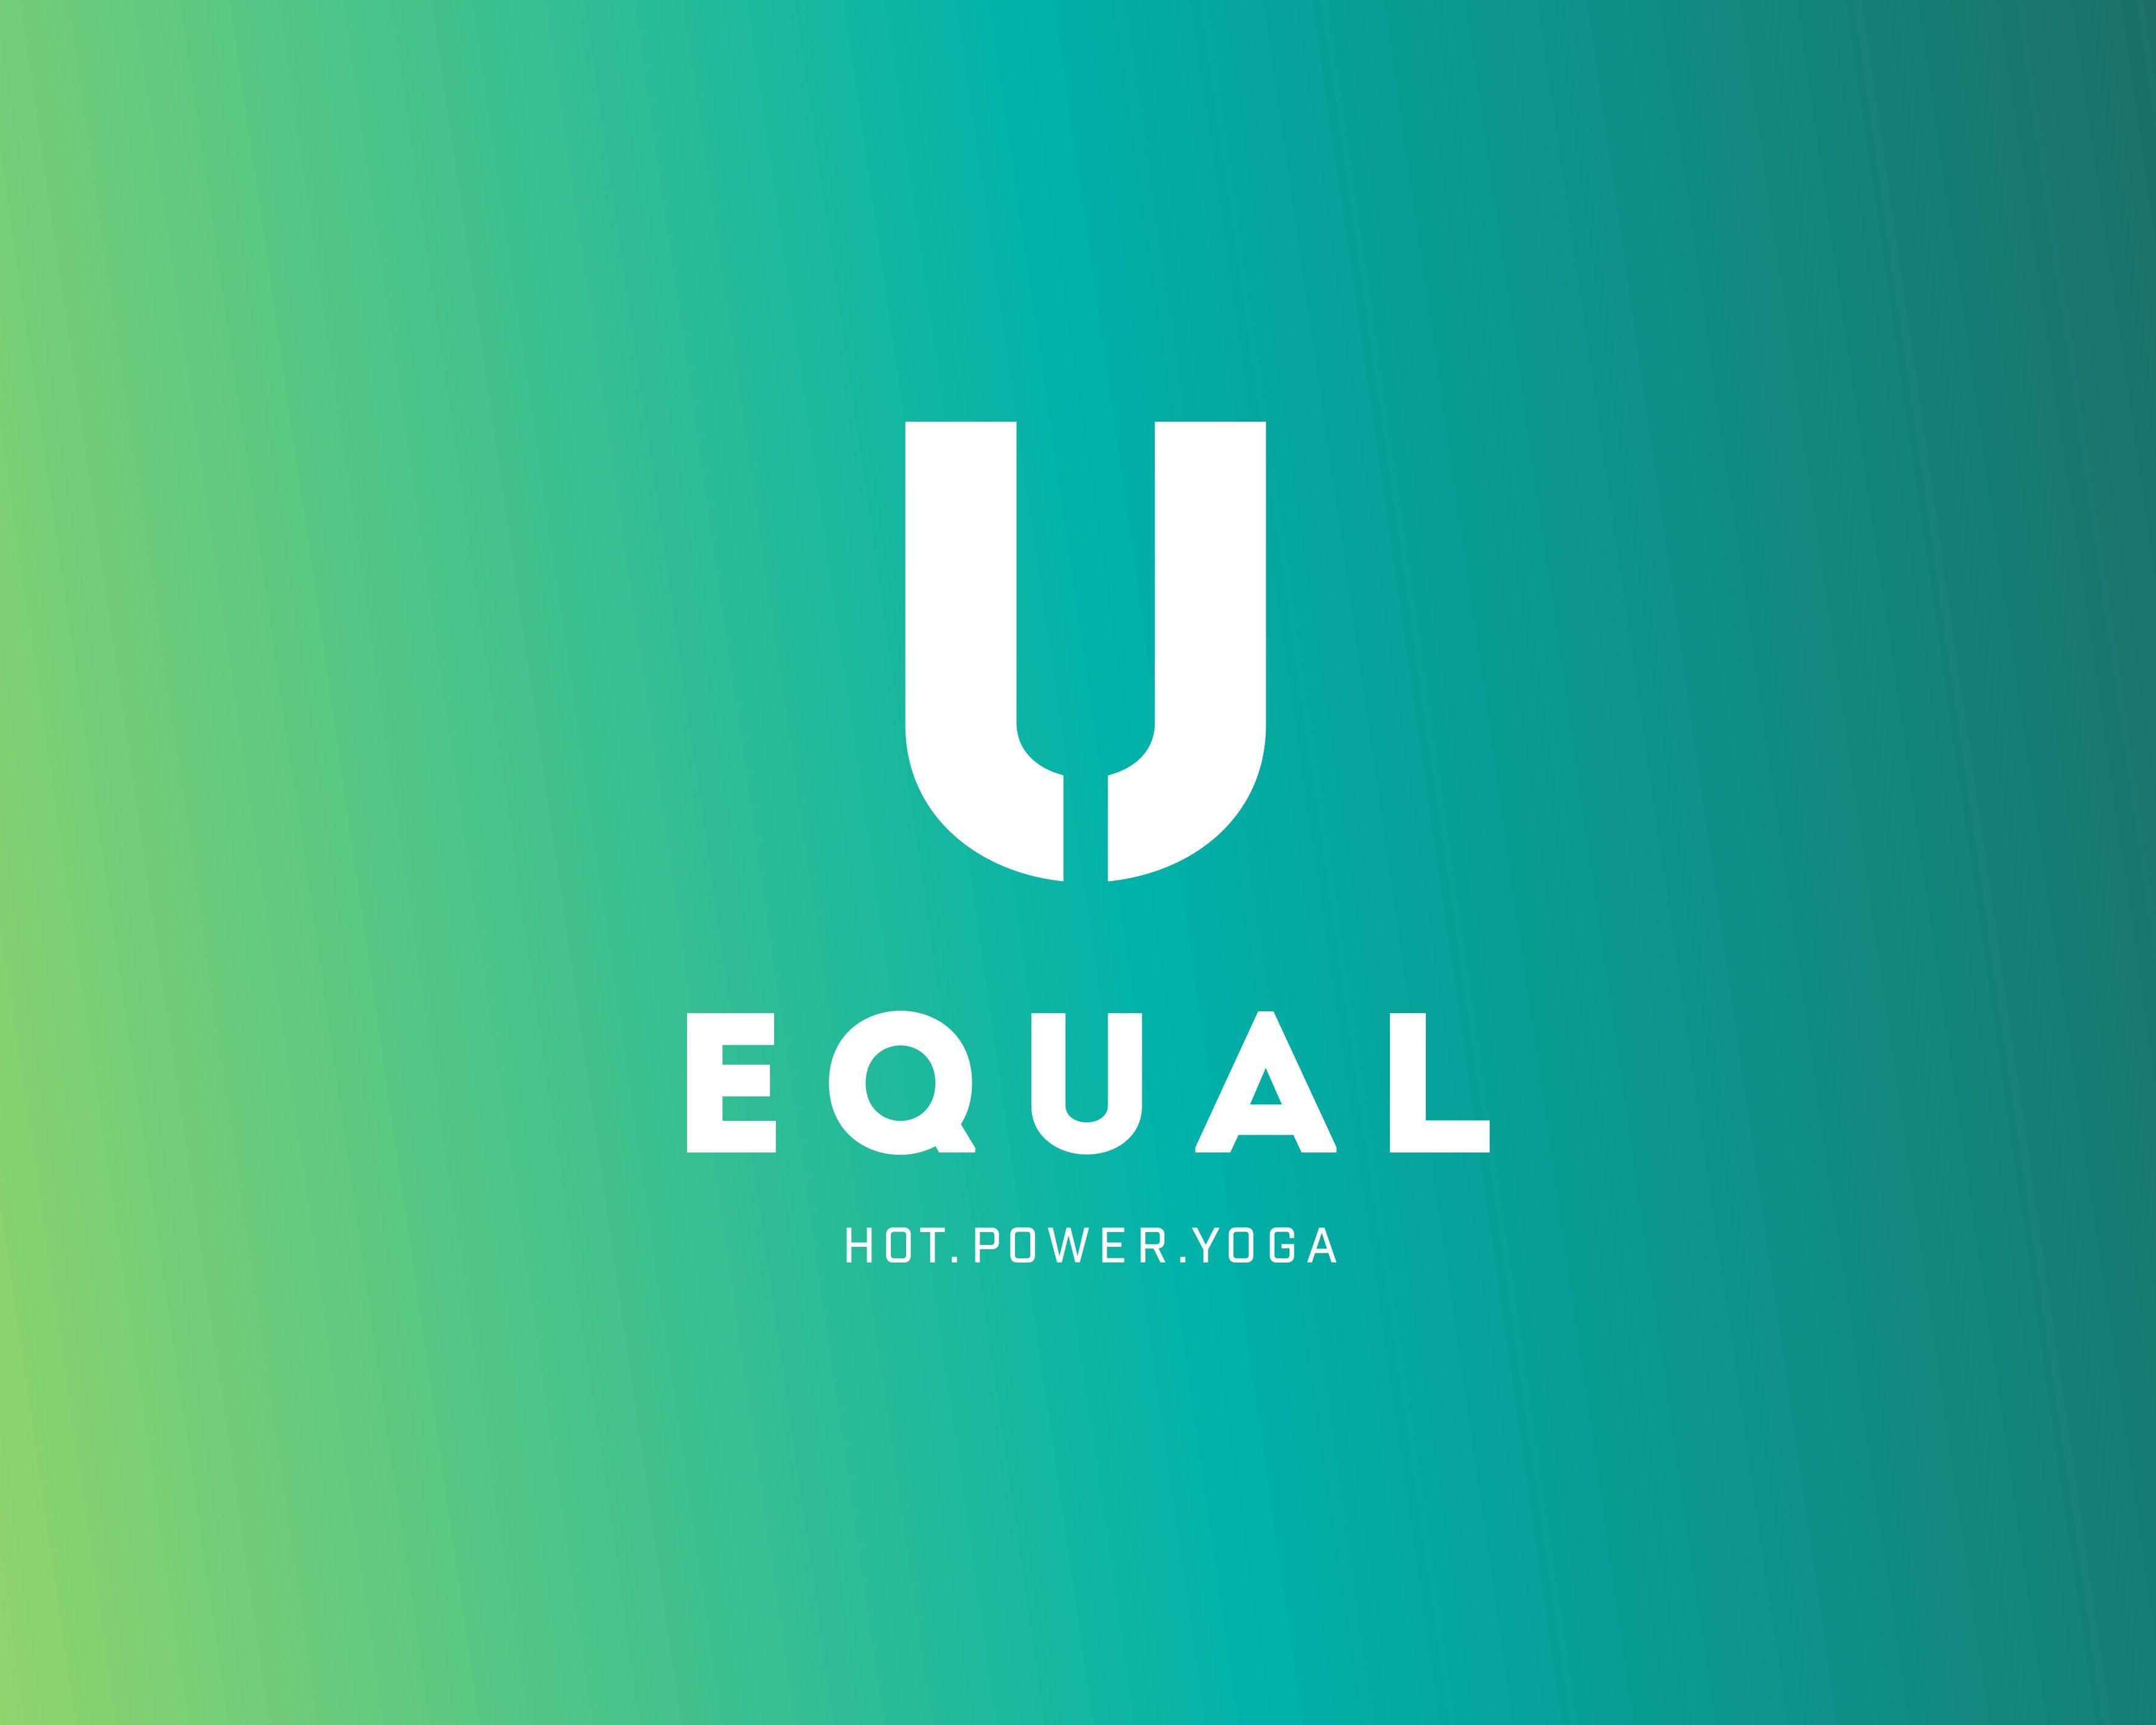 EQUAL - hot power yoga studio design by studio mokum and Kamiel van kessel